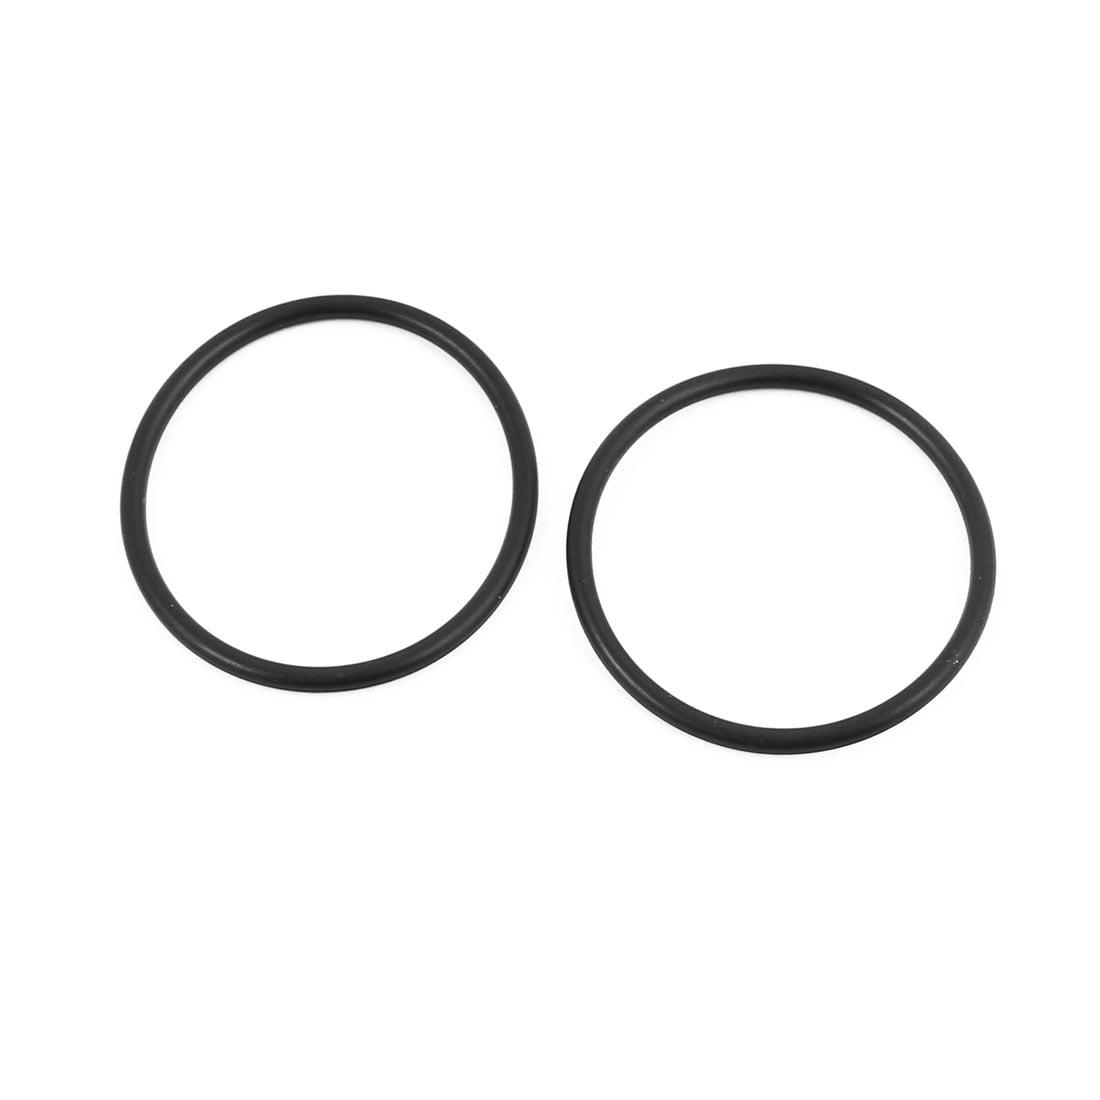 30Pcs 32mm x 1.9mm Rubber O-rings NBR Heat Resistant Sealing Ring Grommets Black